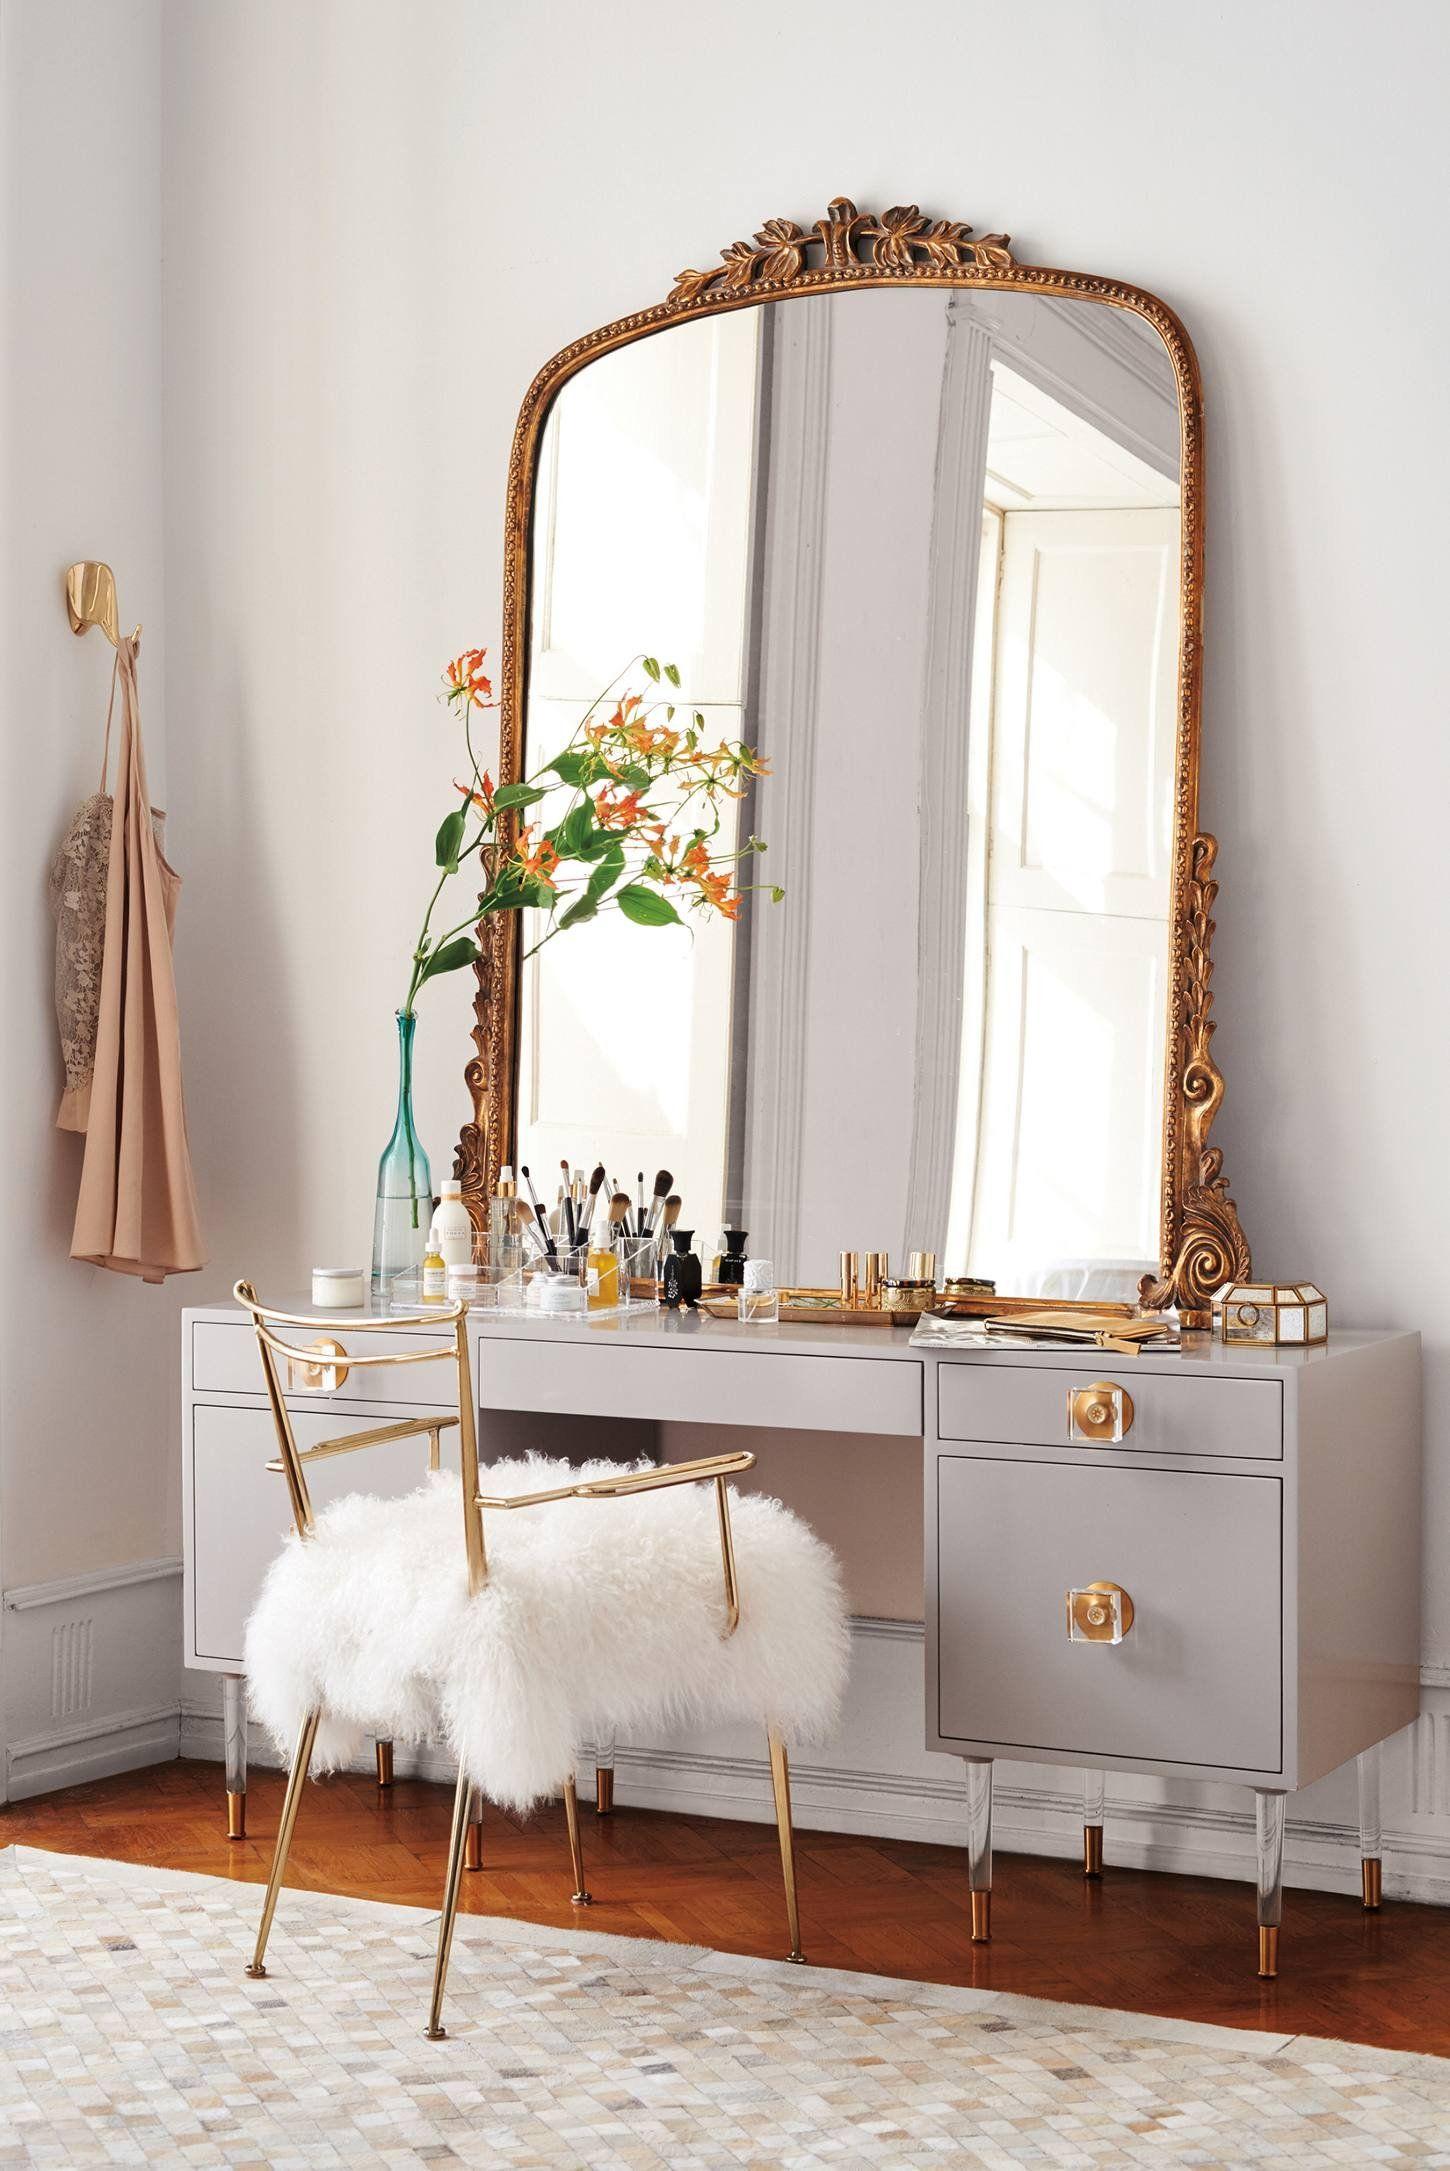 Fluffy Furniture | For the Home | Bedroom decor, Dream decor ...